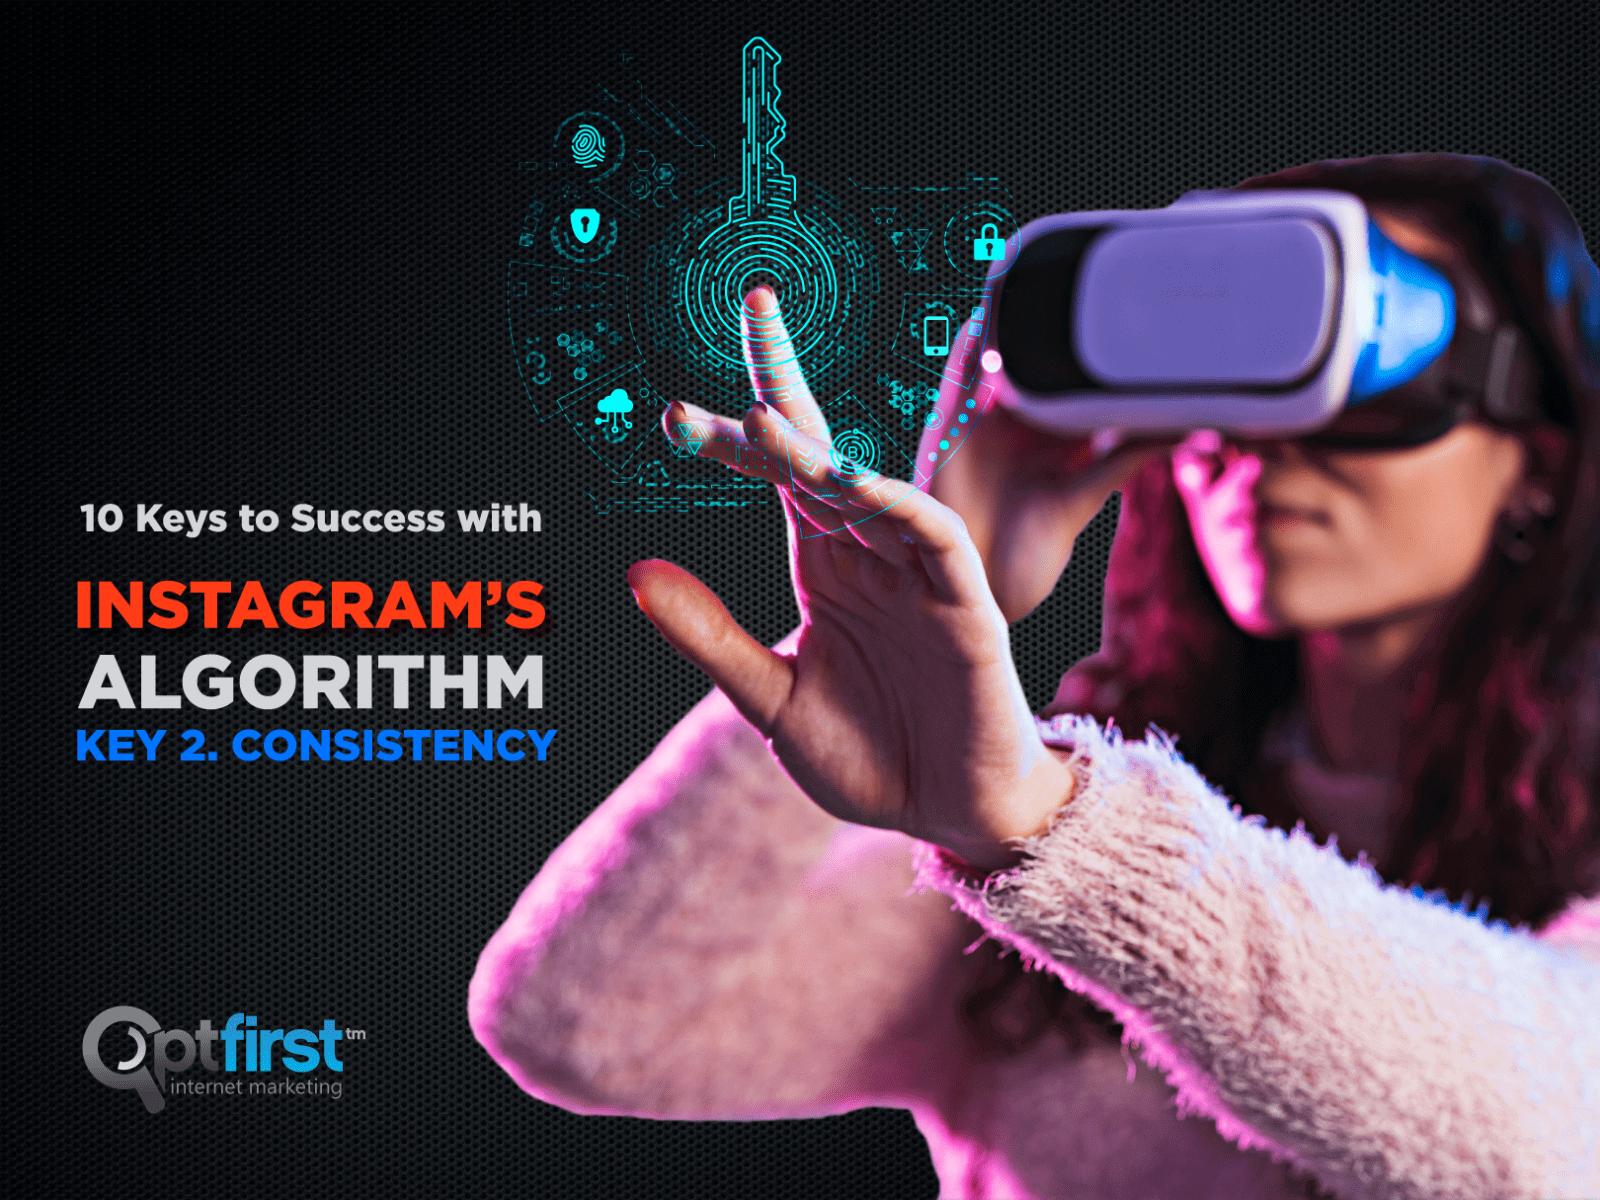 10 Keys to Success with Instagram's Algorithm. Key 3 Content